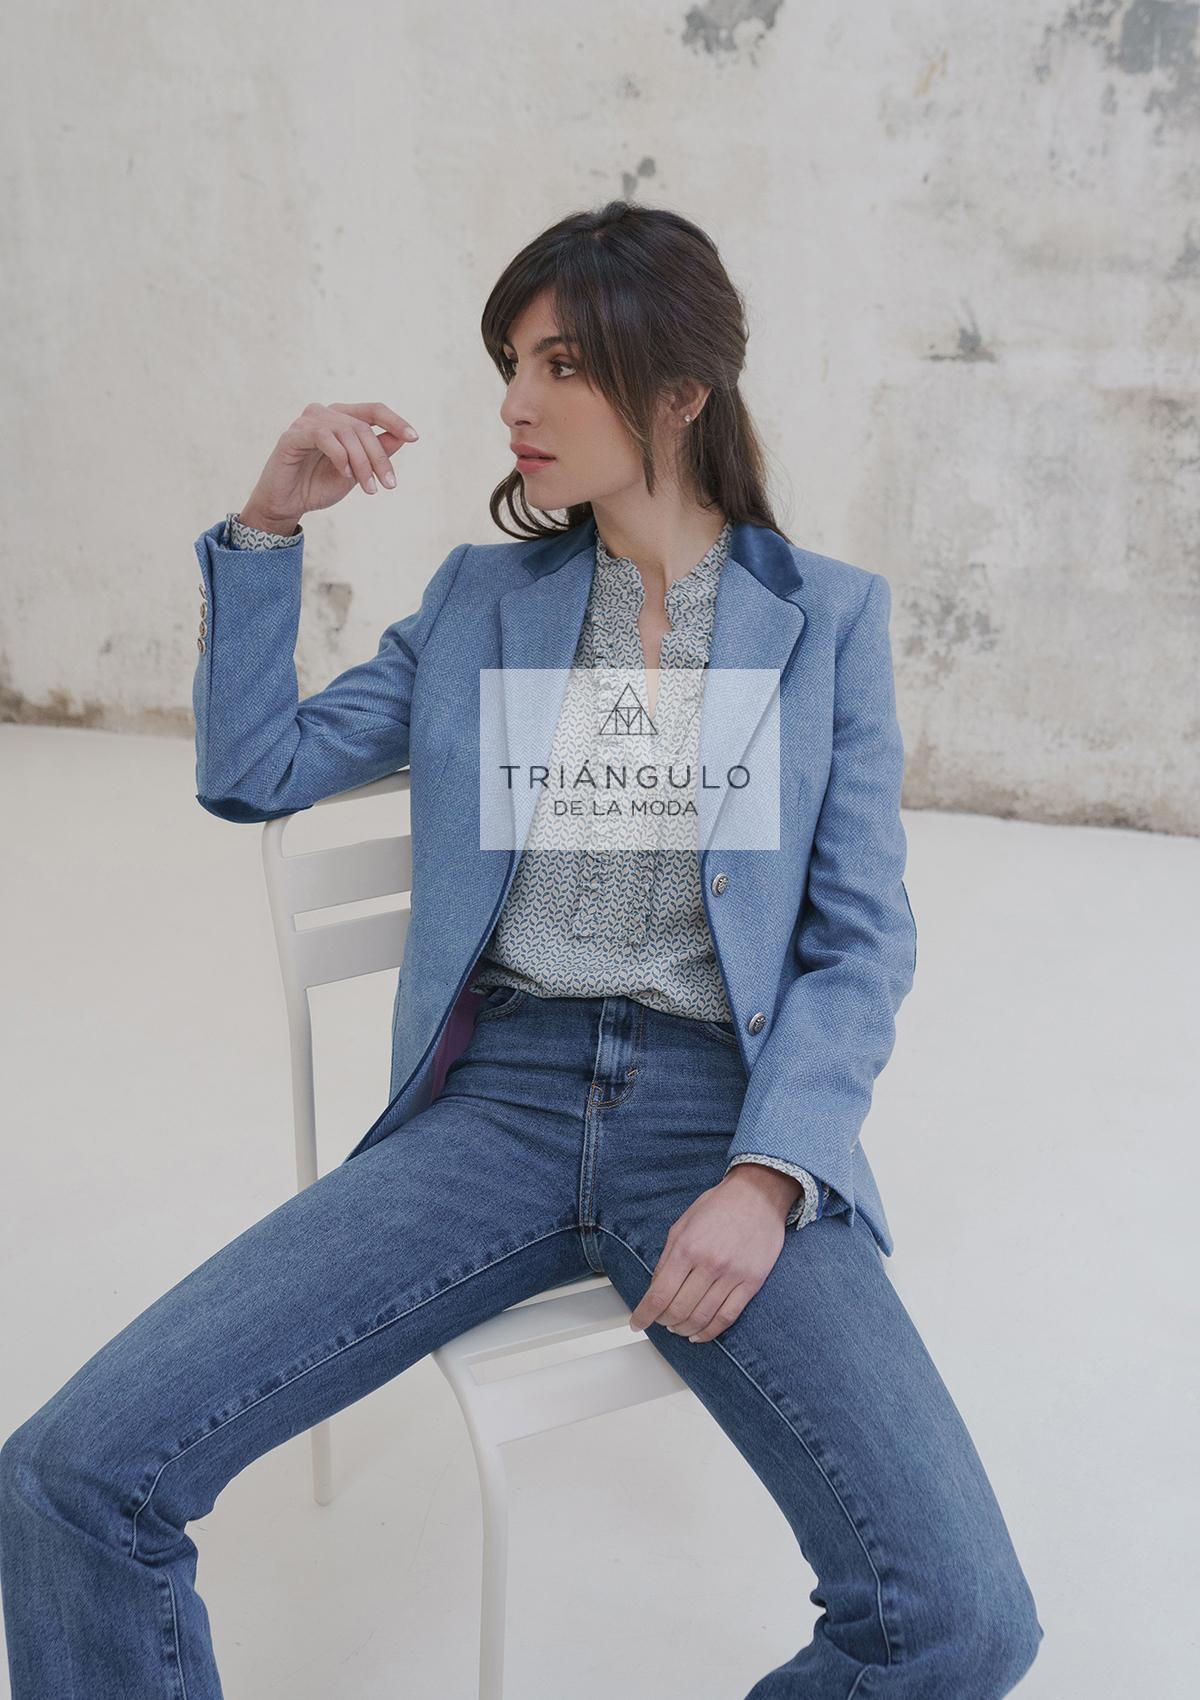 Tienda online del Triangulo de la Moda AMERICANA